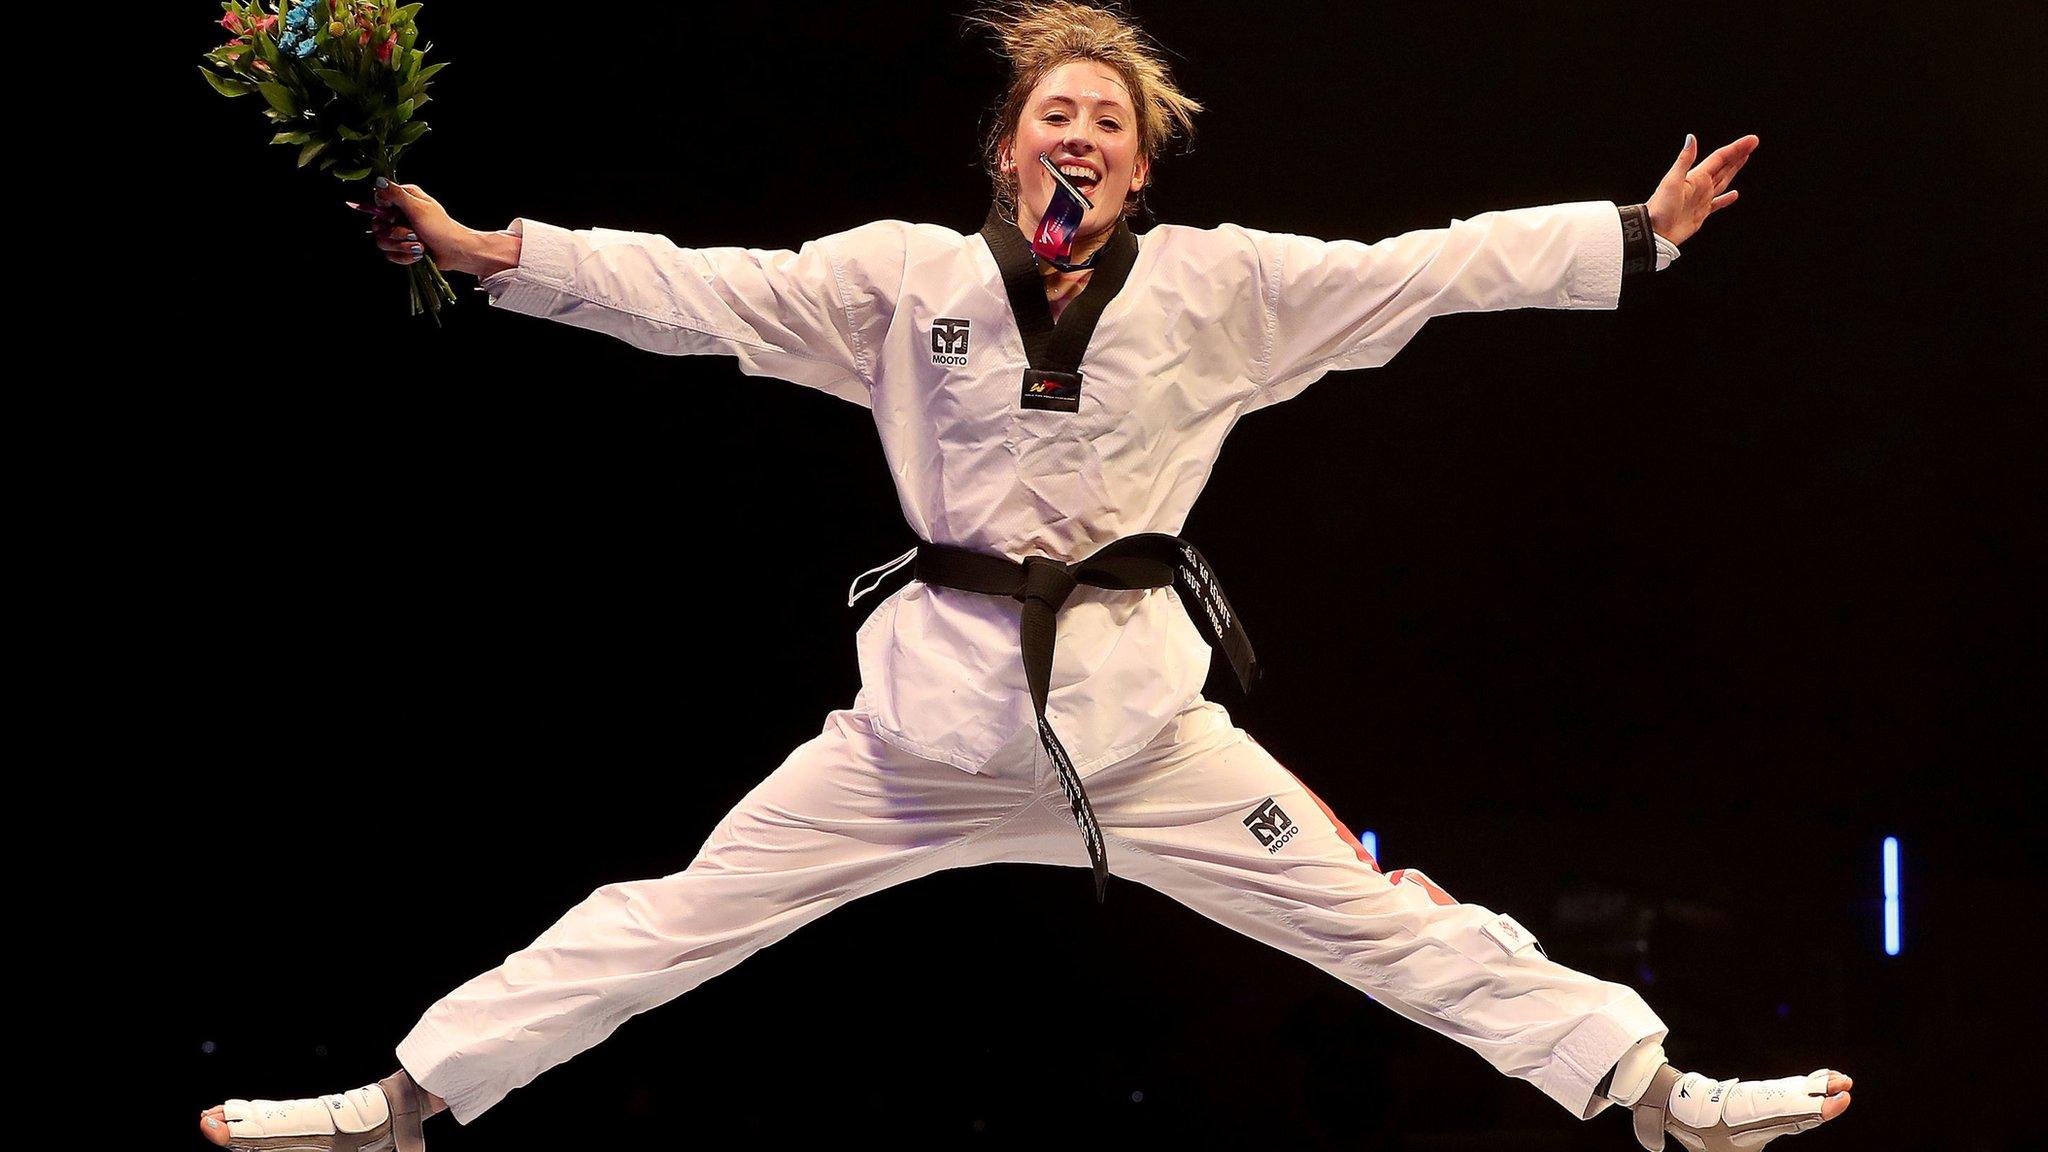 World Taekwondo Championships: Jade Jones wins first world title